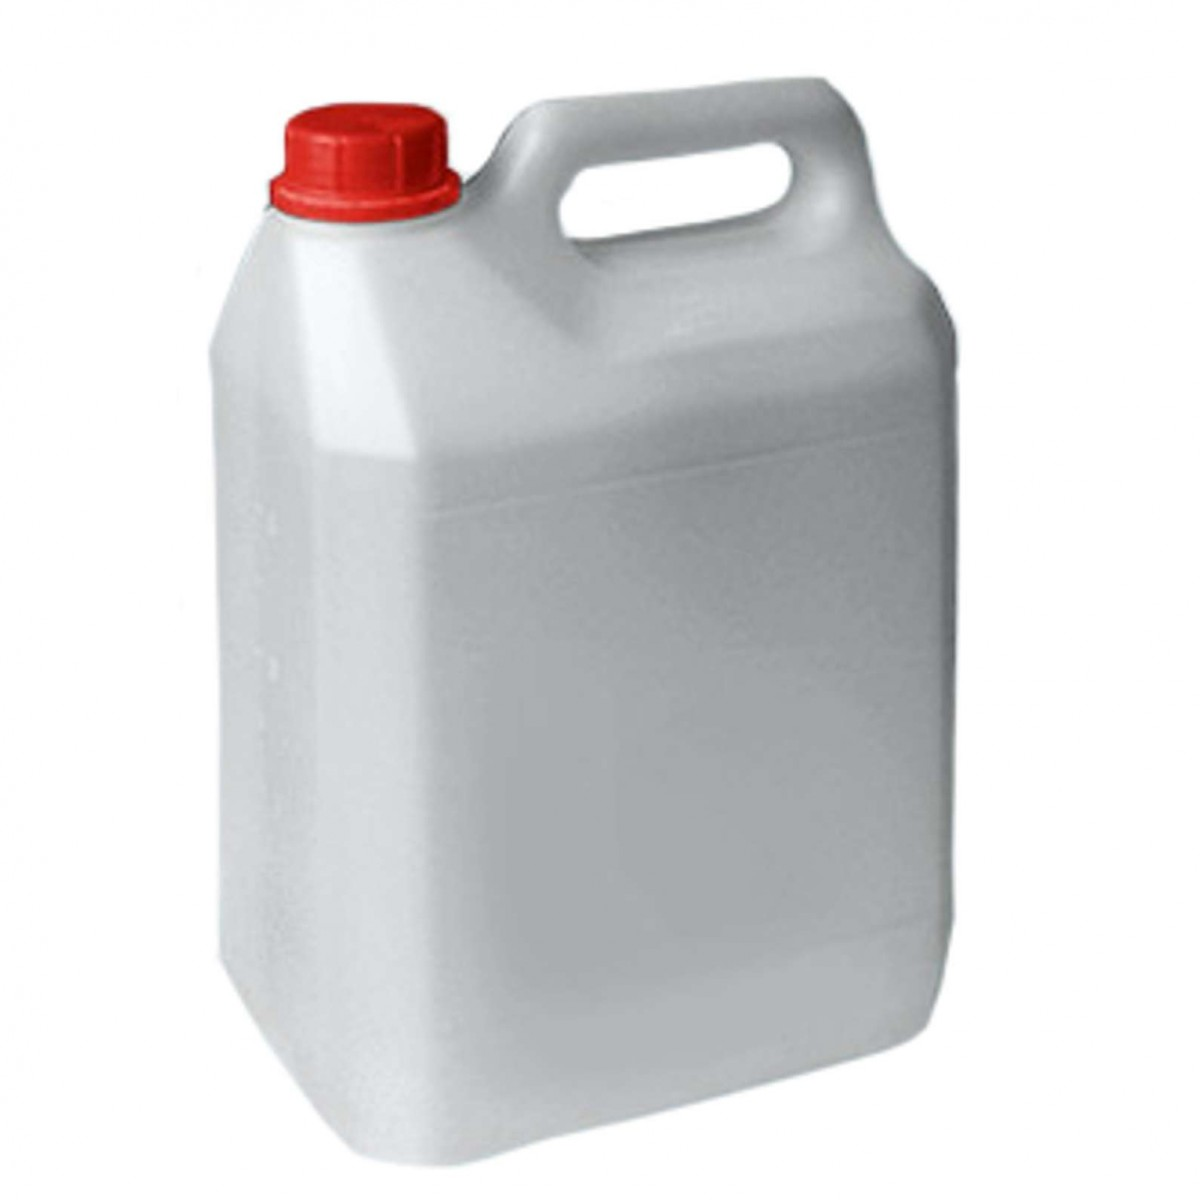 Изопропиловый спирт технический Марка С (ТУ 2421-556-05763441-2016) 5 литров